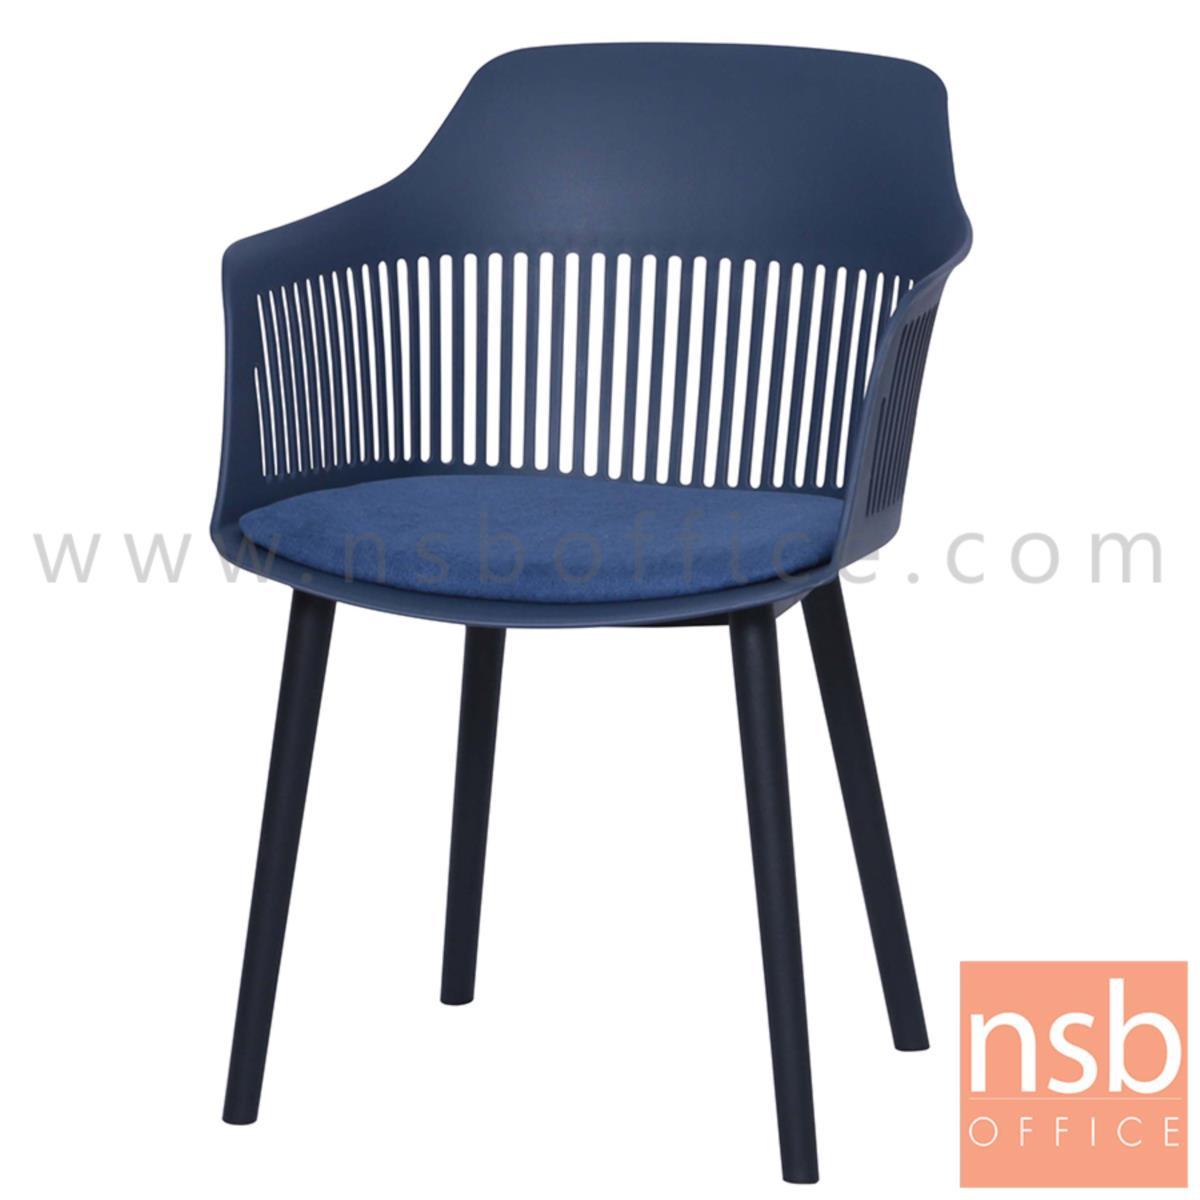 B29A357:เก้าอี้โมเดิร์นที่นั่งหุ้มผ้า  รุ่น Clarksville (คลาร์กสวิลล์)  โครงขาไม้